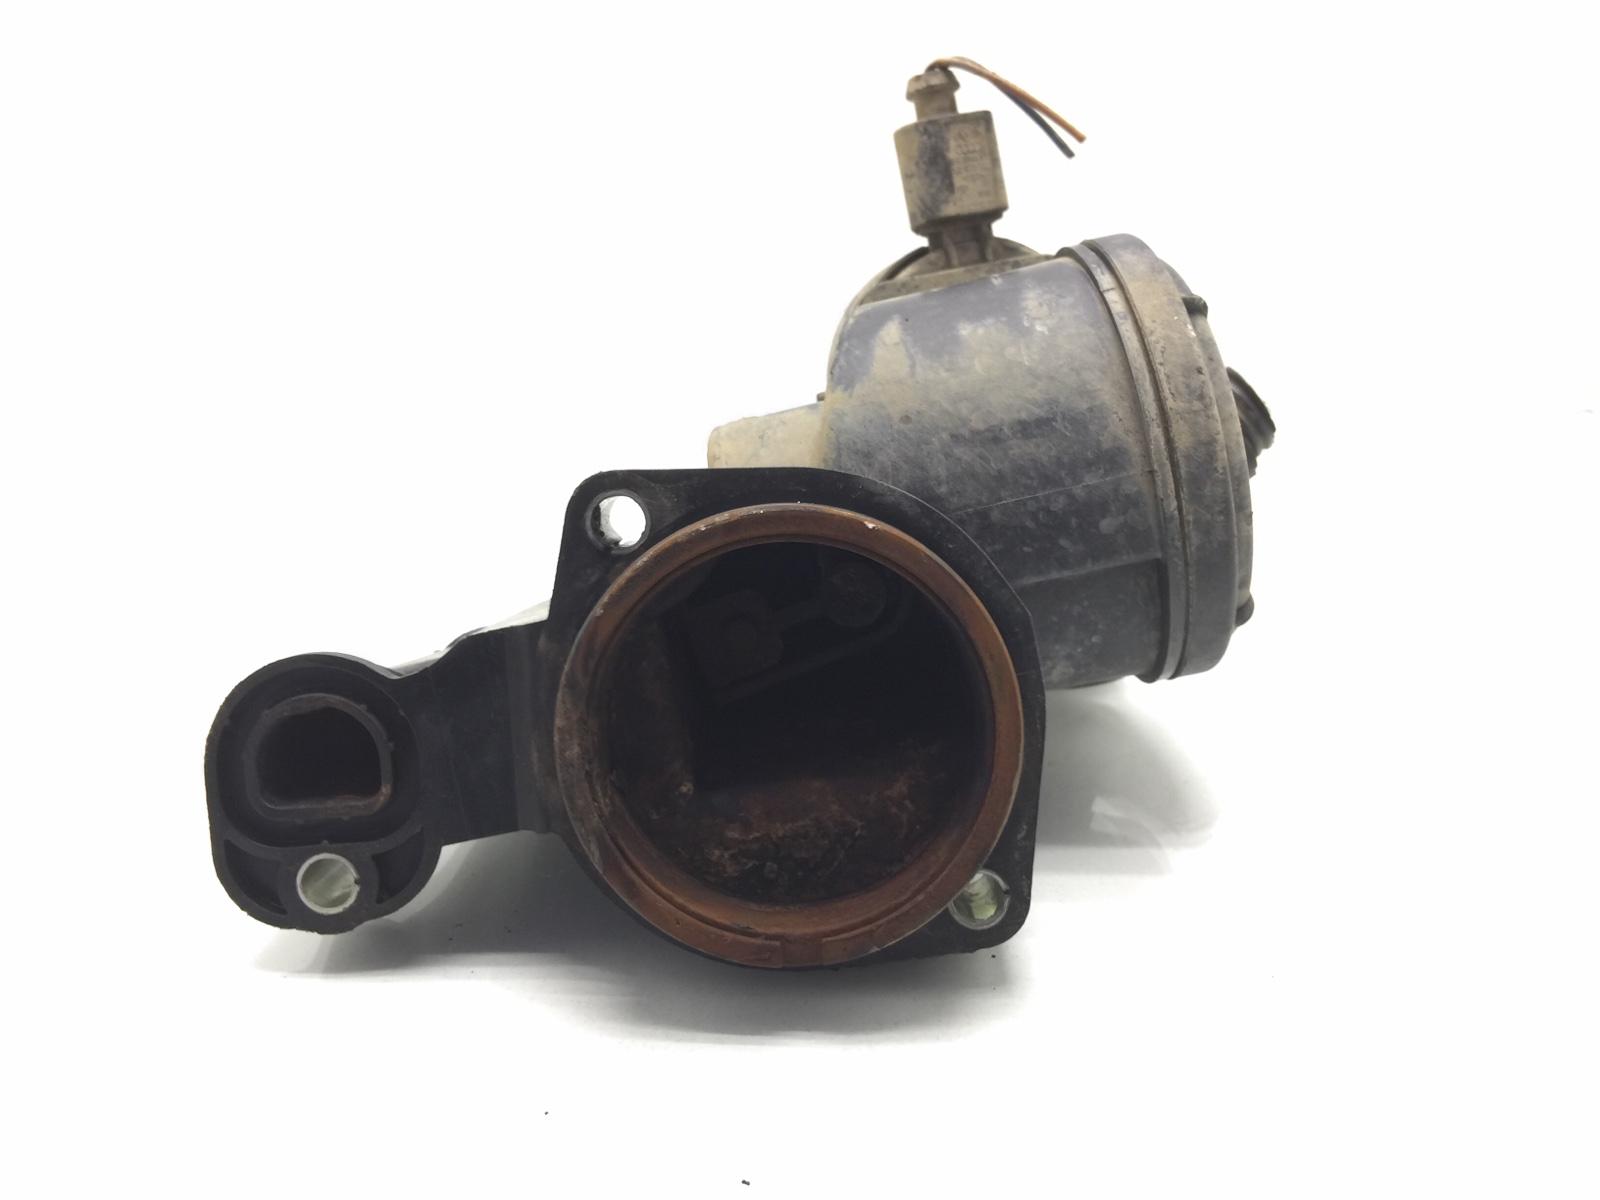 Клапан вентиляции картерных газов Seat Ibiza 3 1.4 I 2006 (б/у)